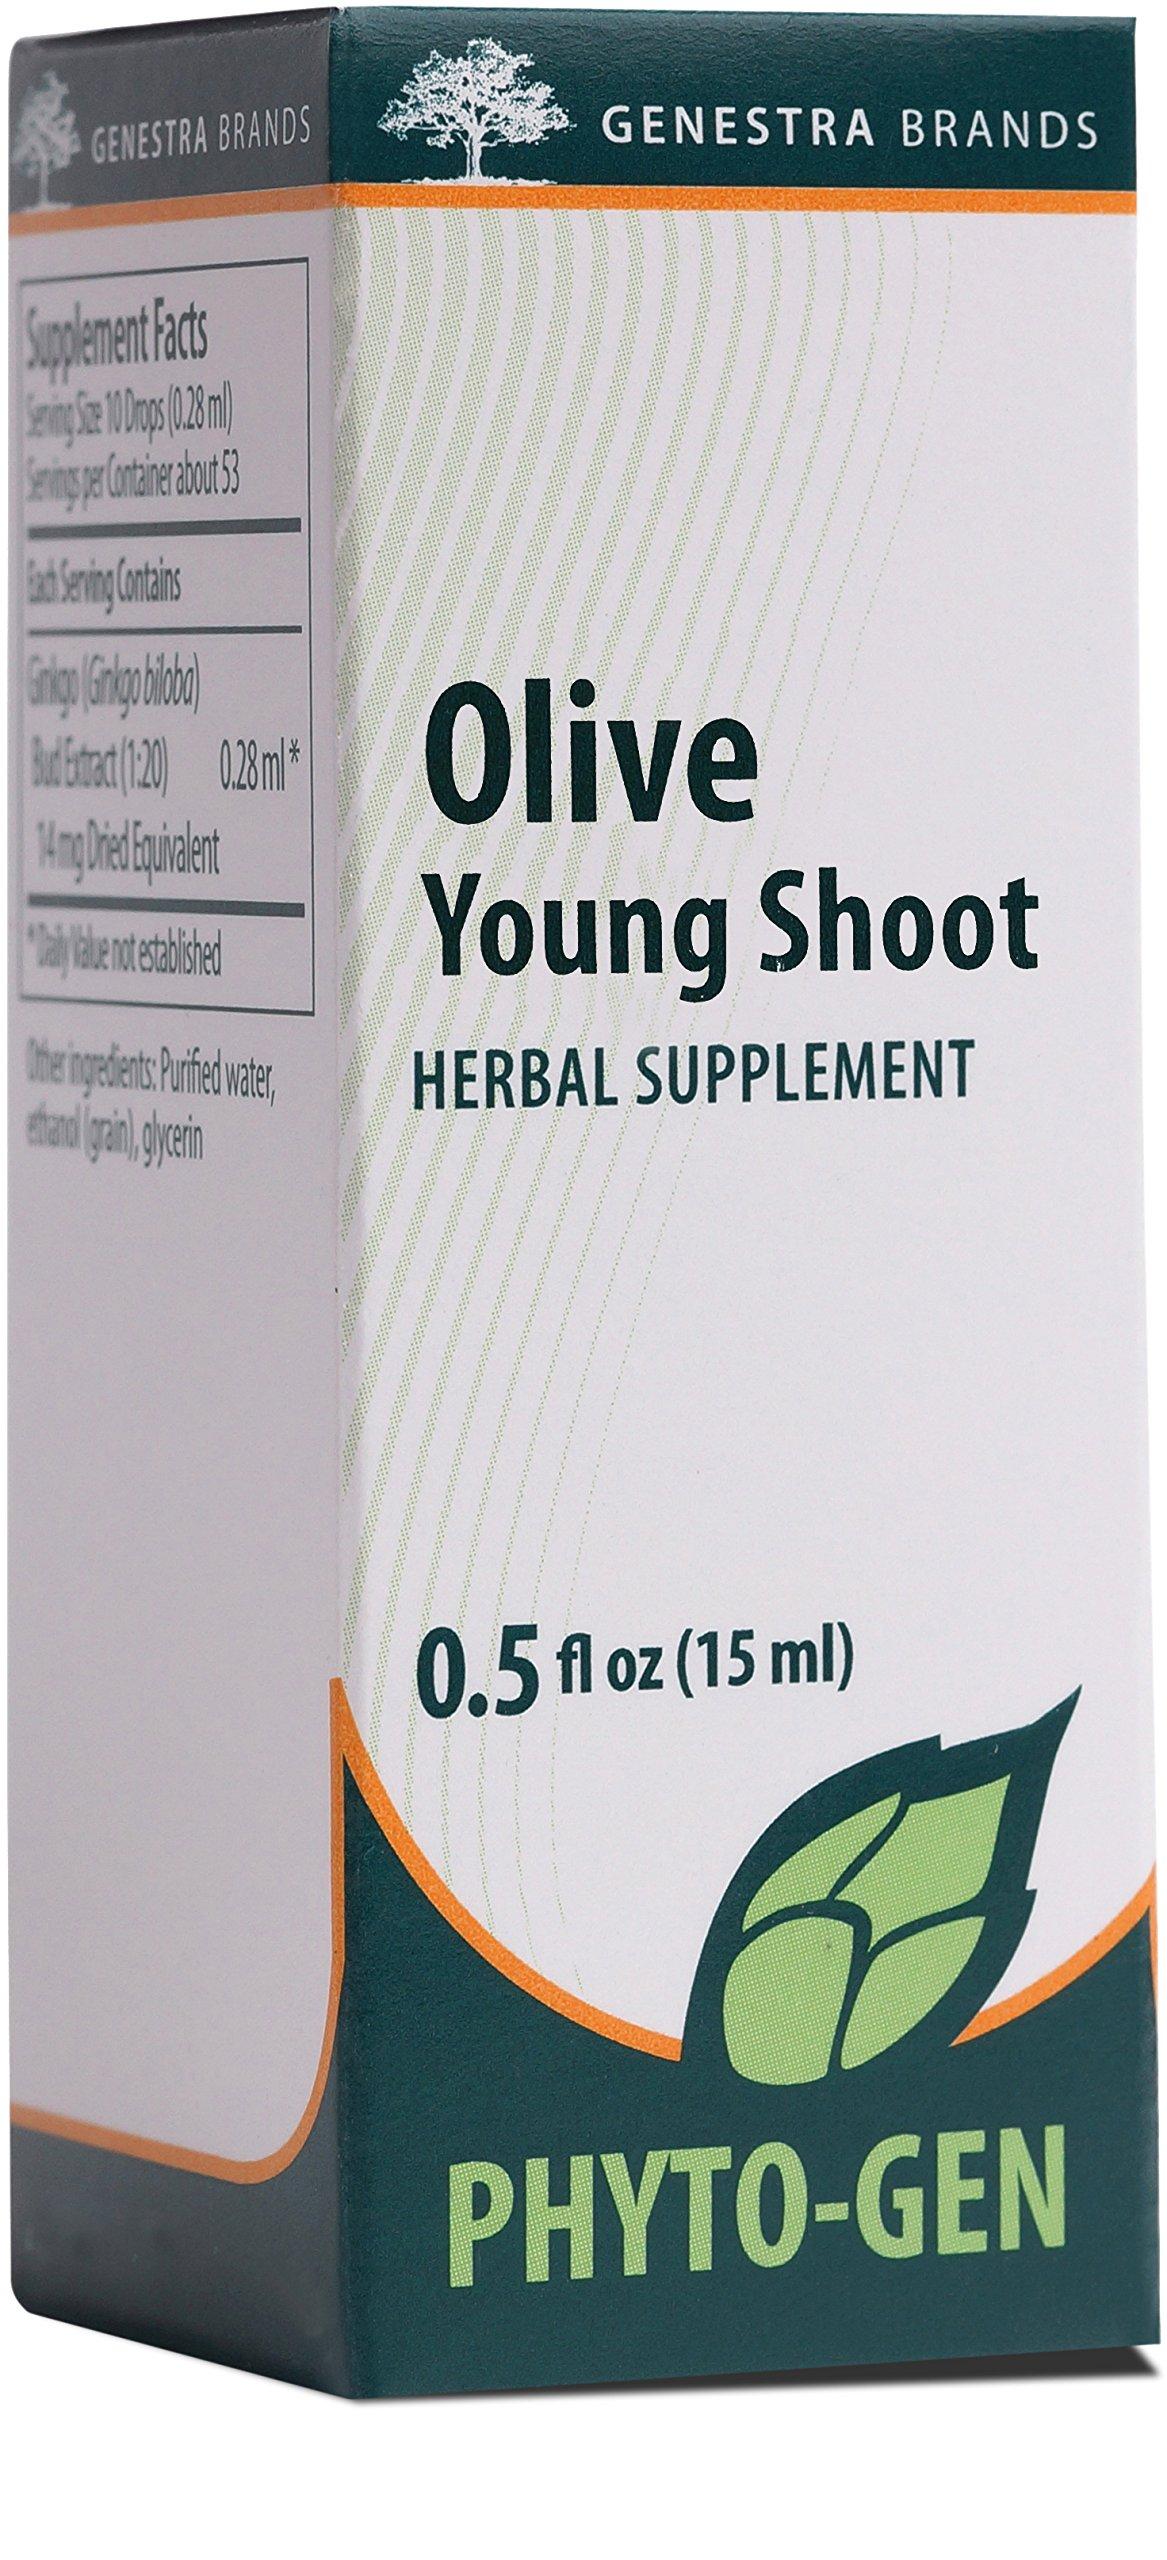 Genestra Brands - Olive Young Shoot - Herbal Supplement - 0.5 fl. oz.